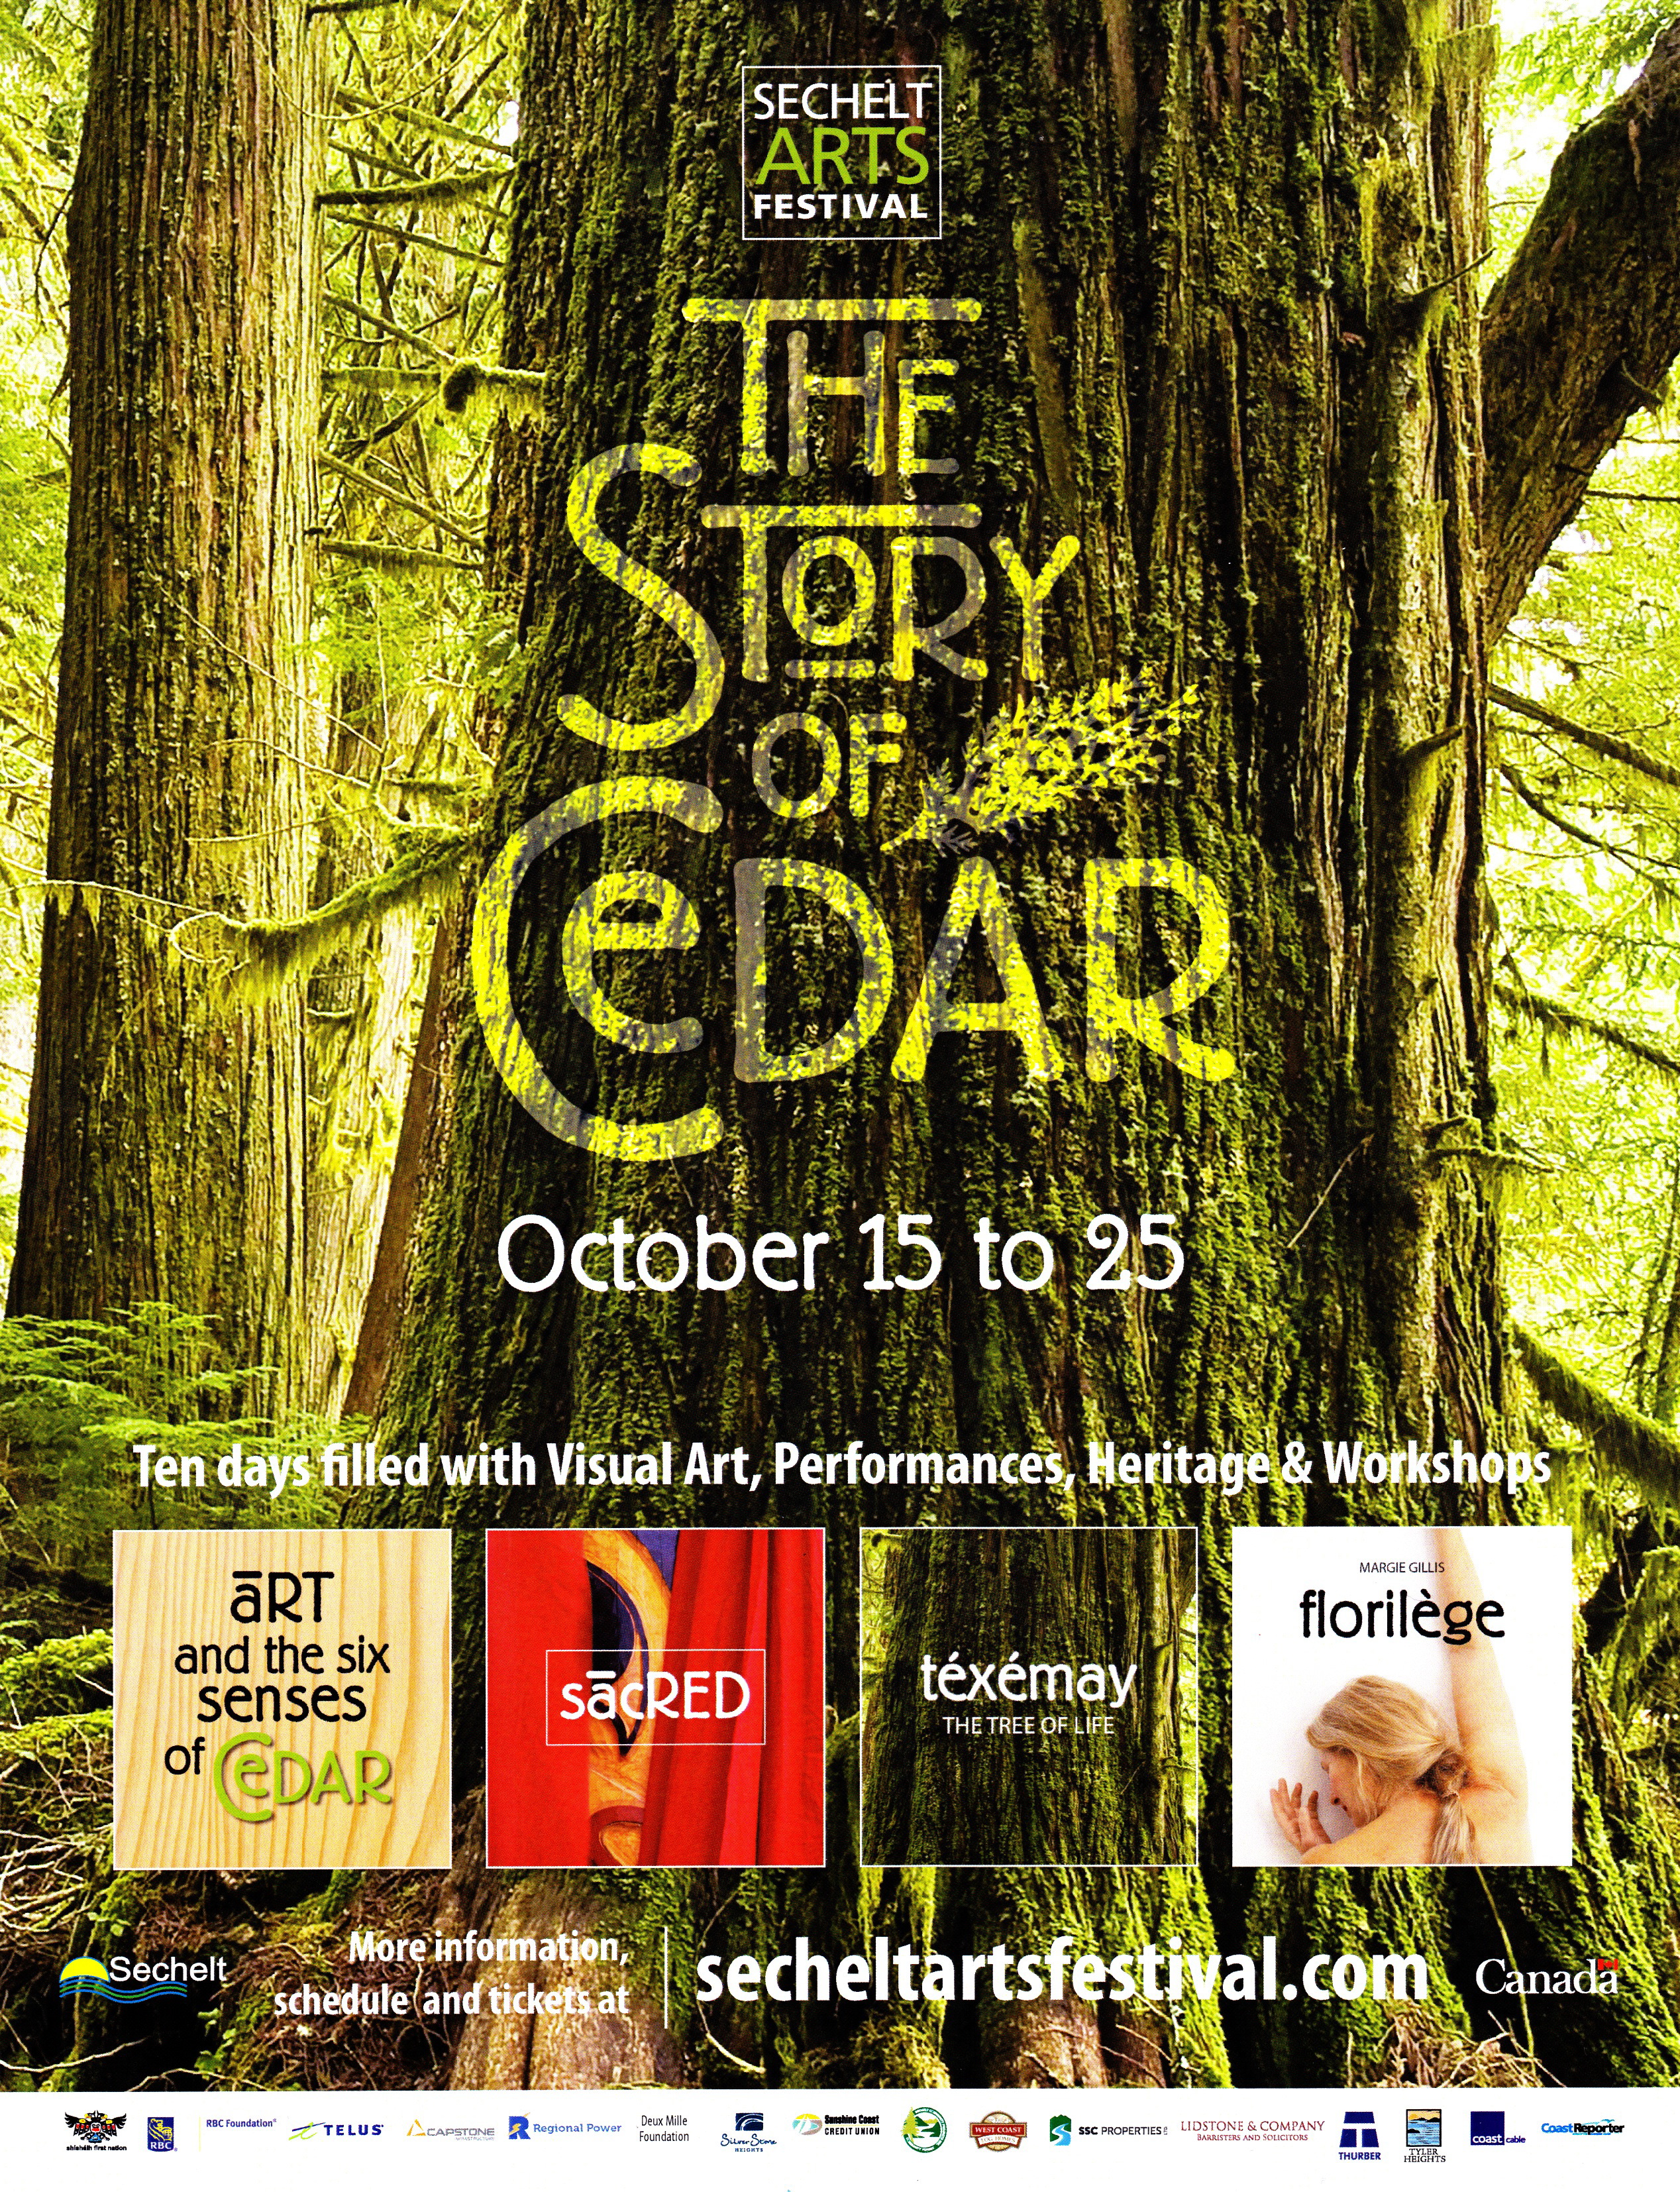 The Story of Cedar 1